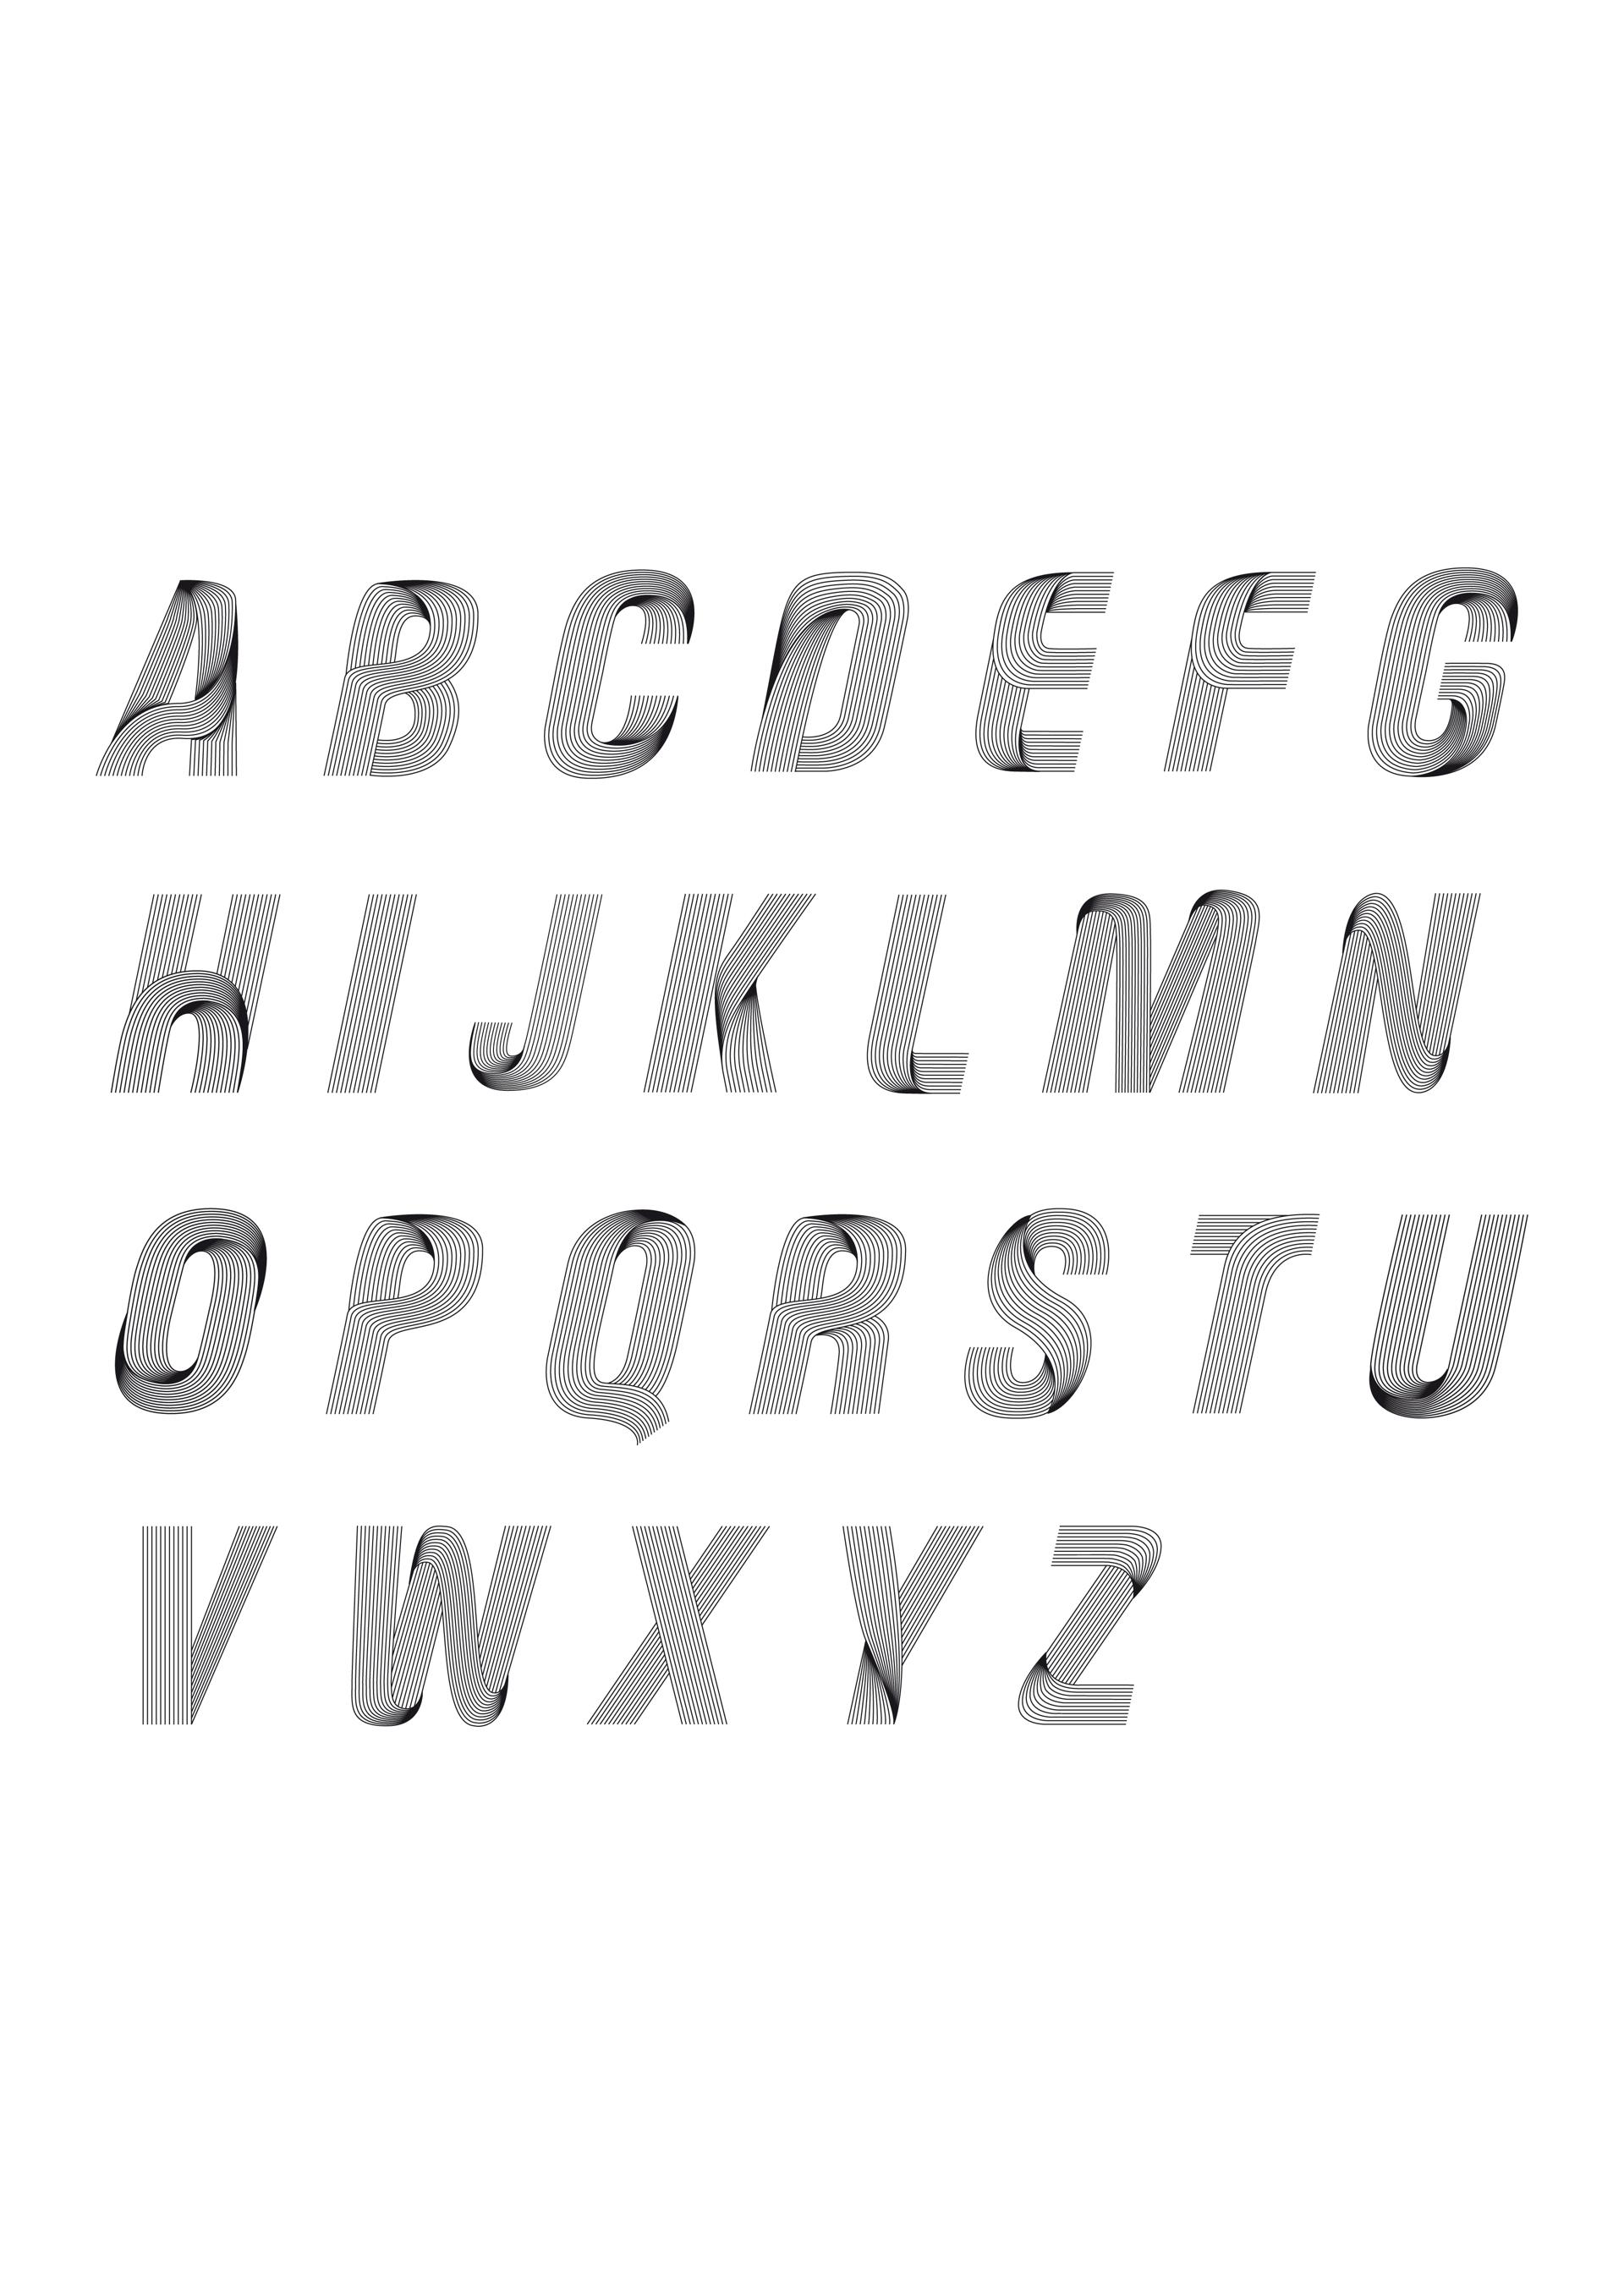 marc-valls-design-oldskull-7